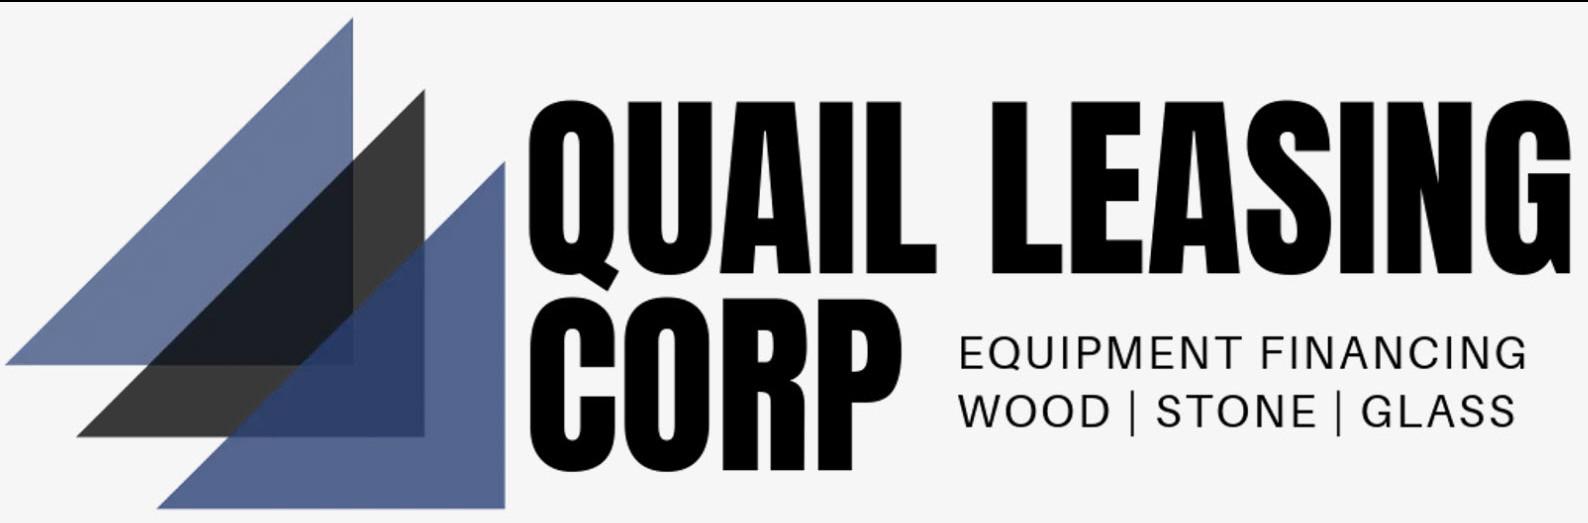 Quail Leasing Corp